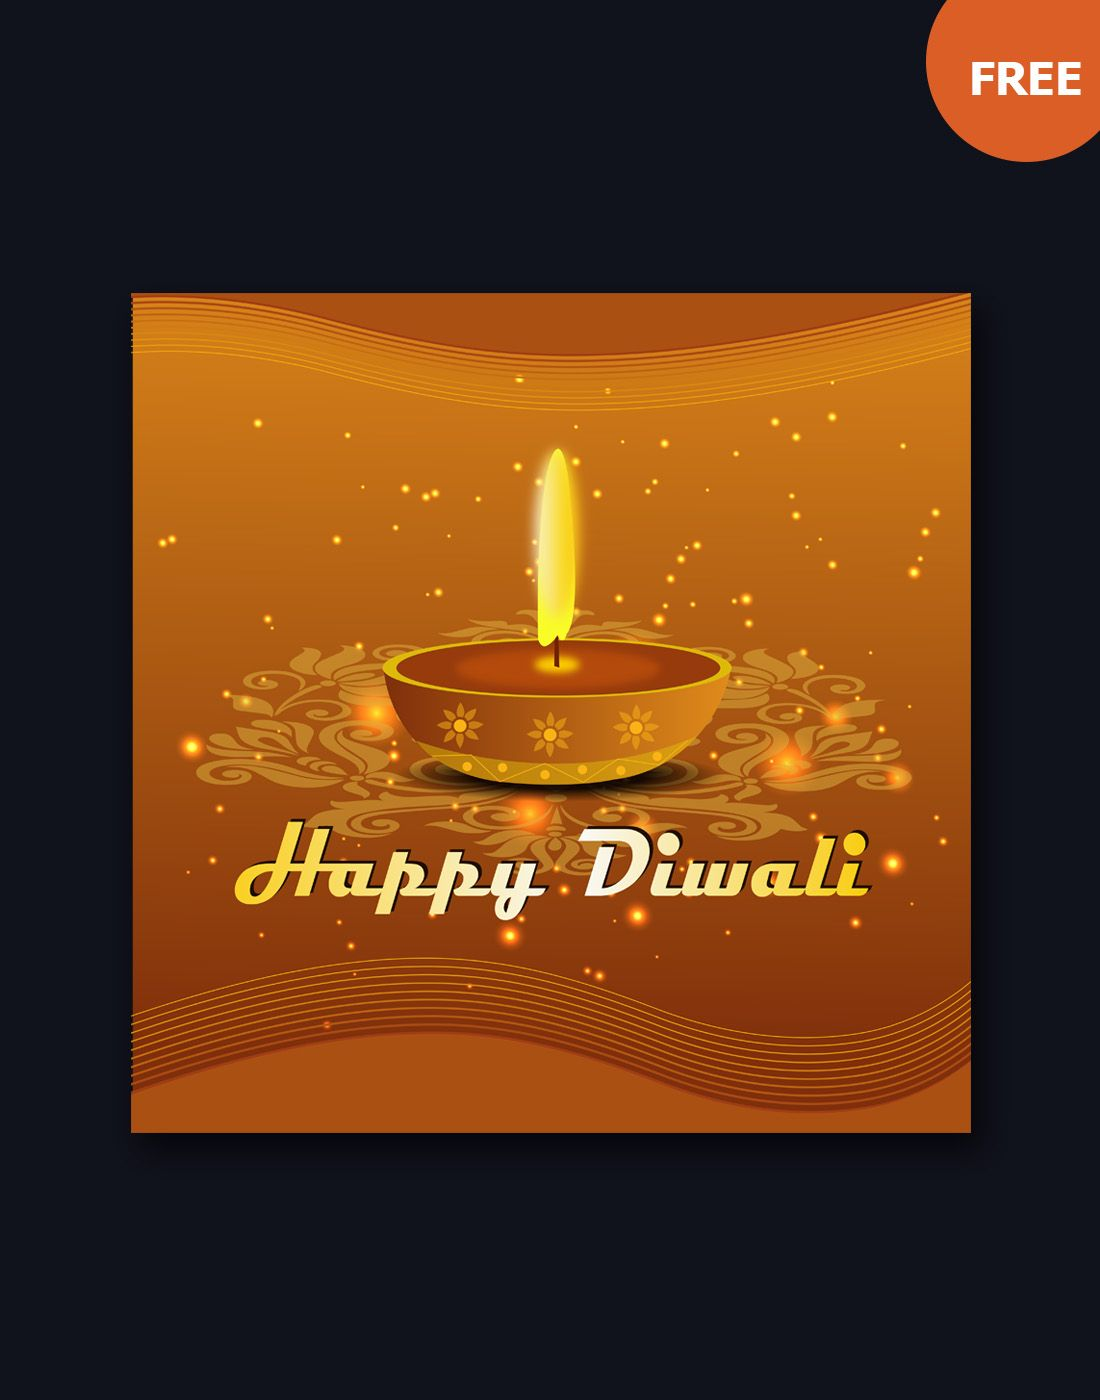 Free Diwali Templates Happy Diwali Images Diwali Design Indian Wedding Invitation Cards